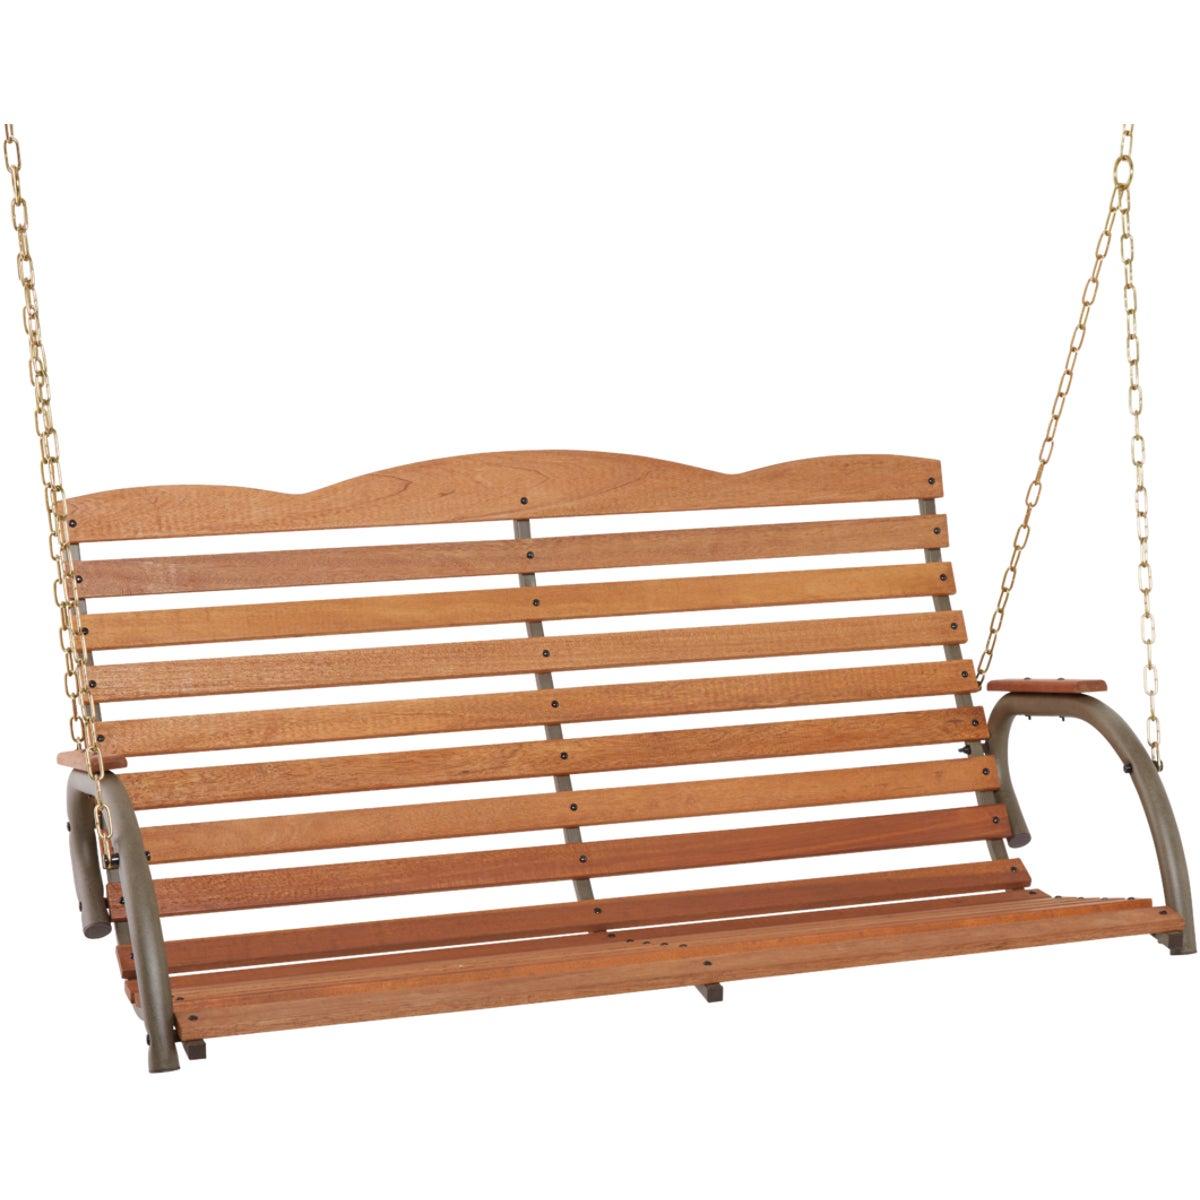 "48"" BRONZE SWING SEAT"